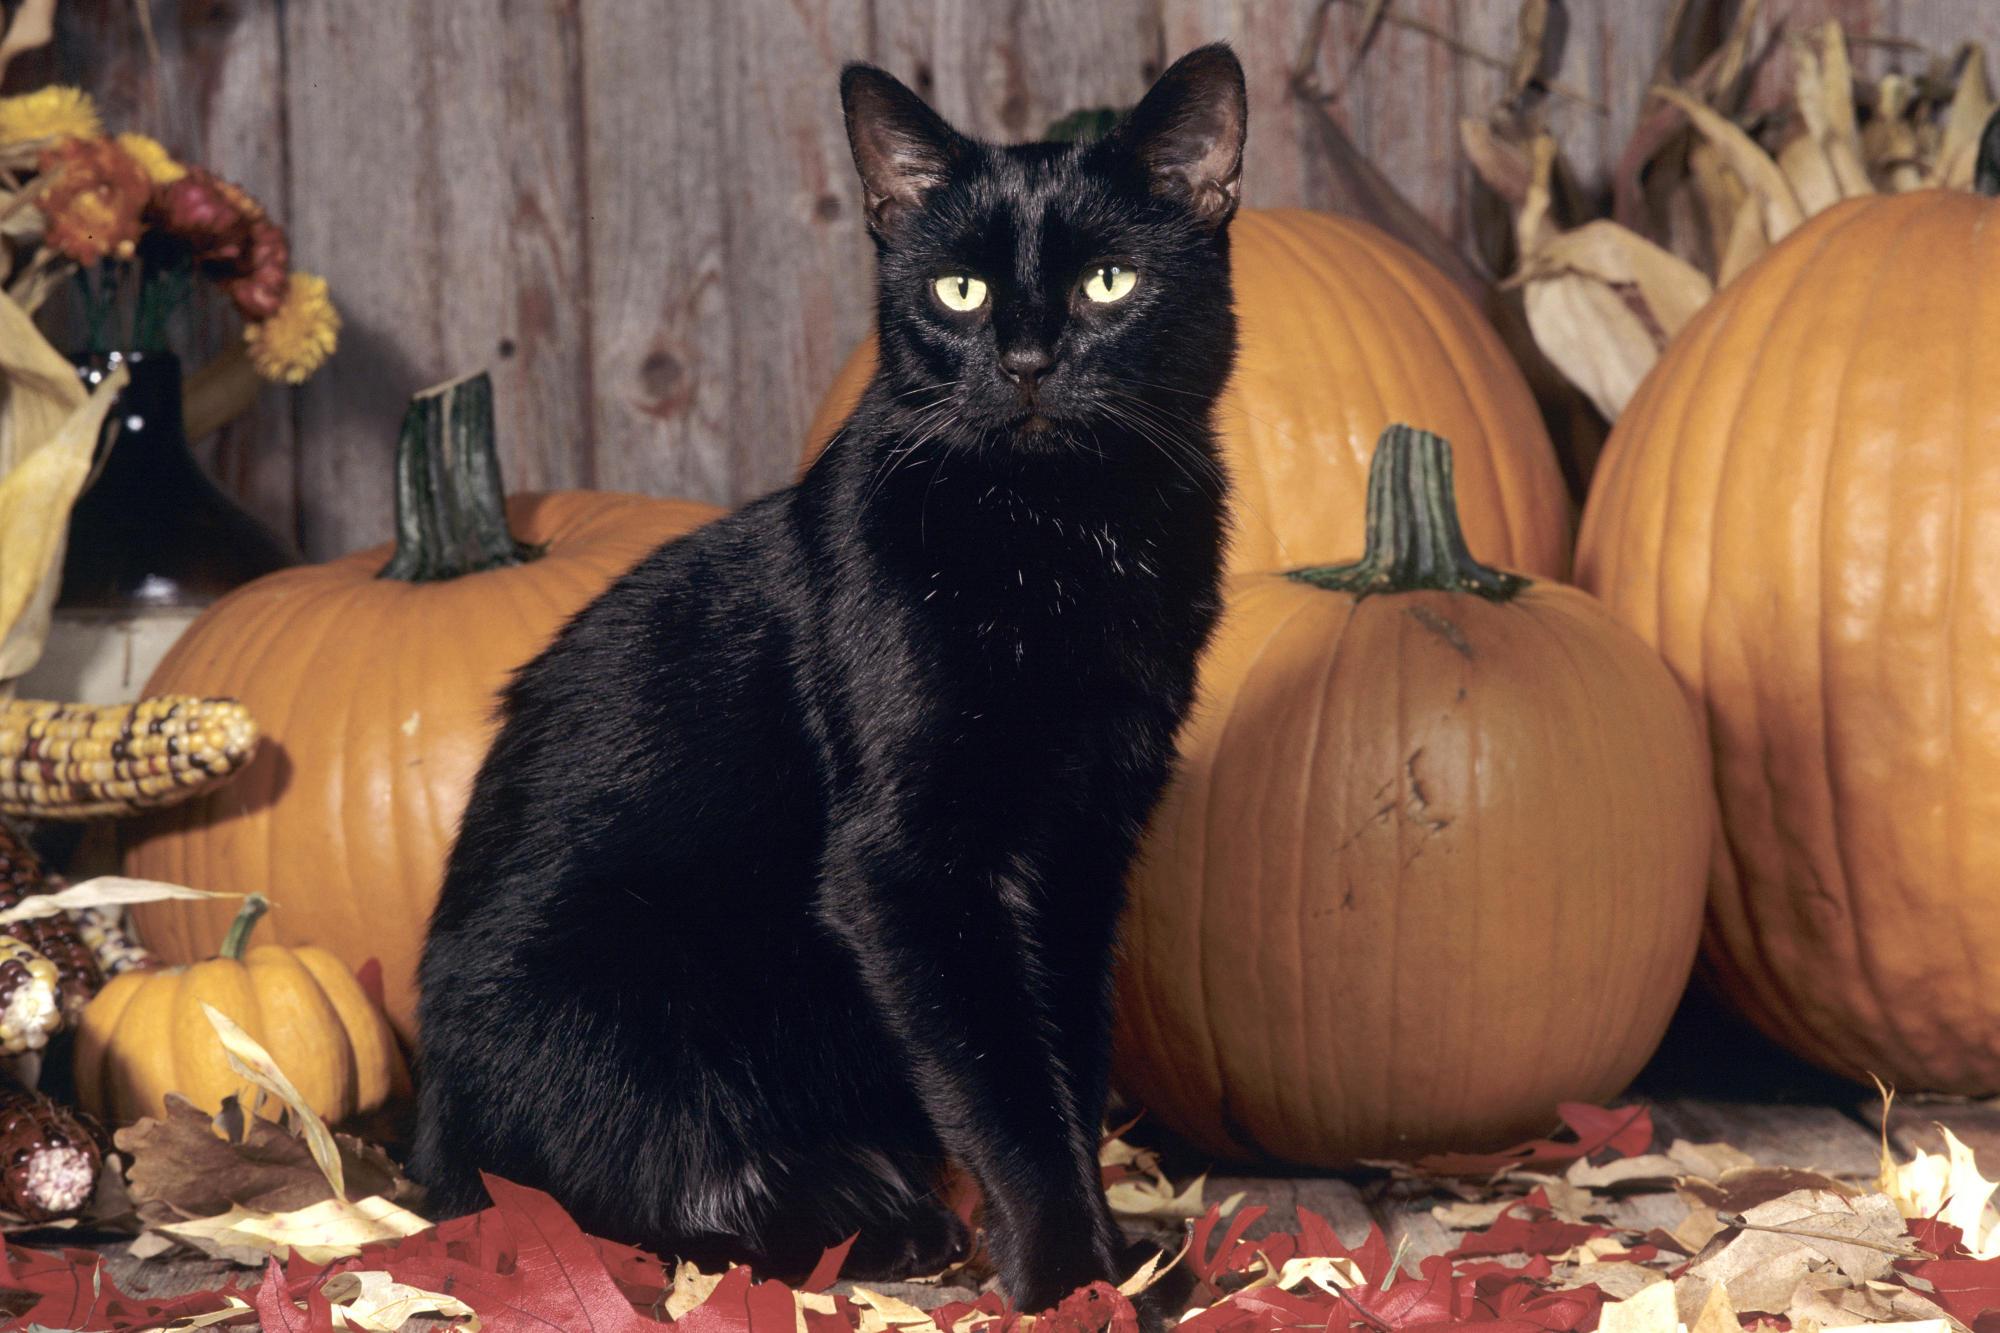 Scary Black Cat Wallpaper Black Cat Wallpaper Halloween 2000x1333 Download Hd Wallpaper Wallpapertip